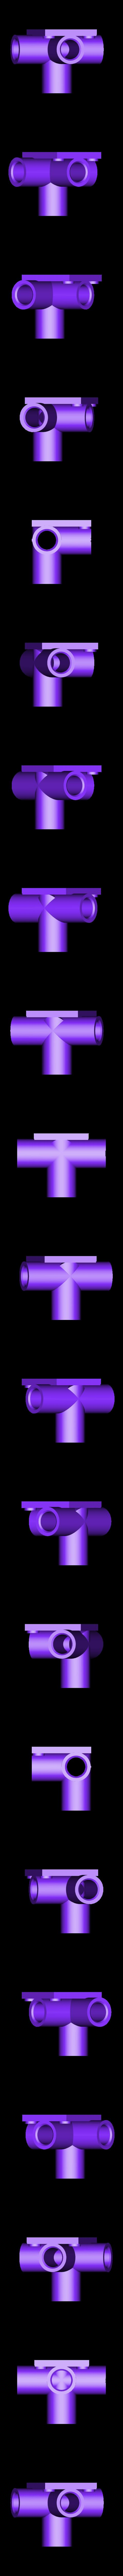 P&B_29.stl Download free STL file P & B ARMY (PIPE AND BOARD) • 3D printable model, DJER